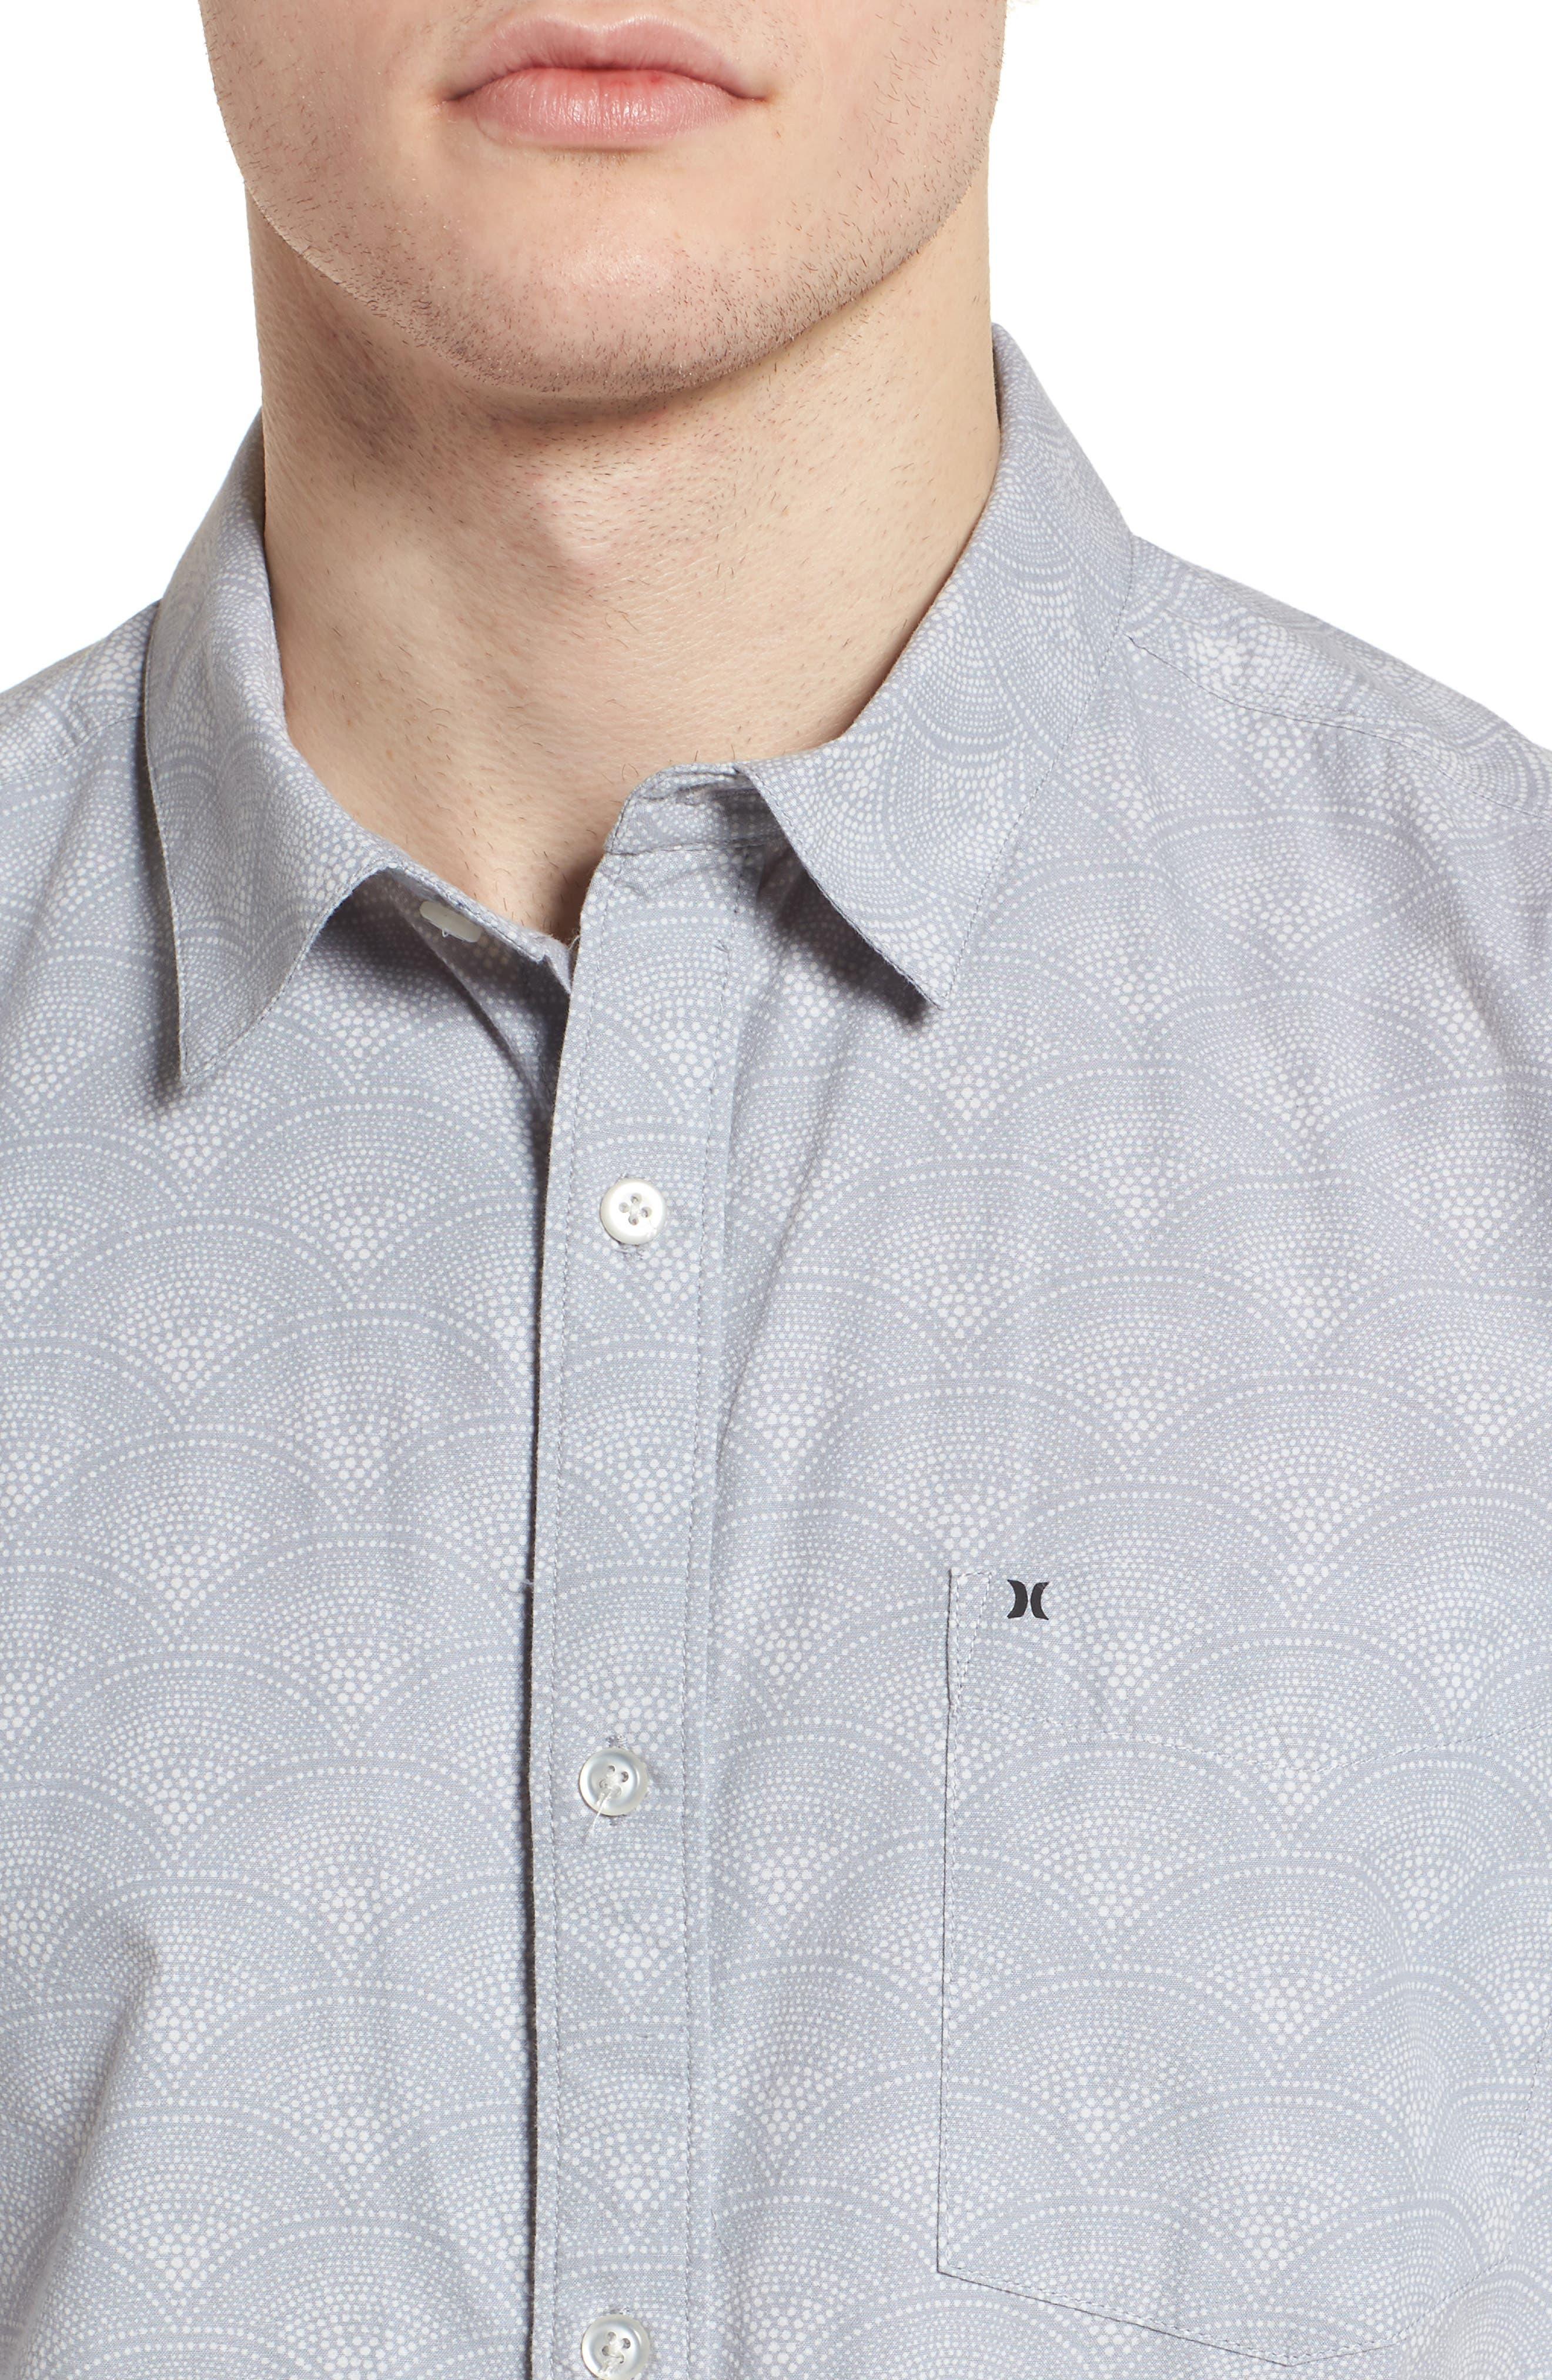 Pescado Short Sleeve Oxford Shirt,                             Alternate thumbnail 4, color,                             LIGHT PUMICE